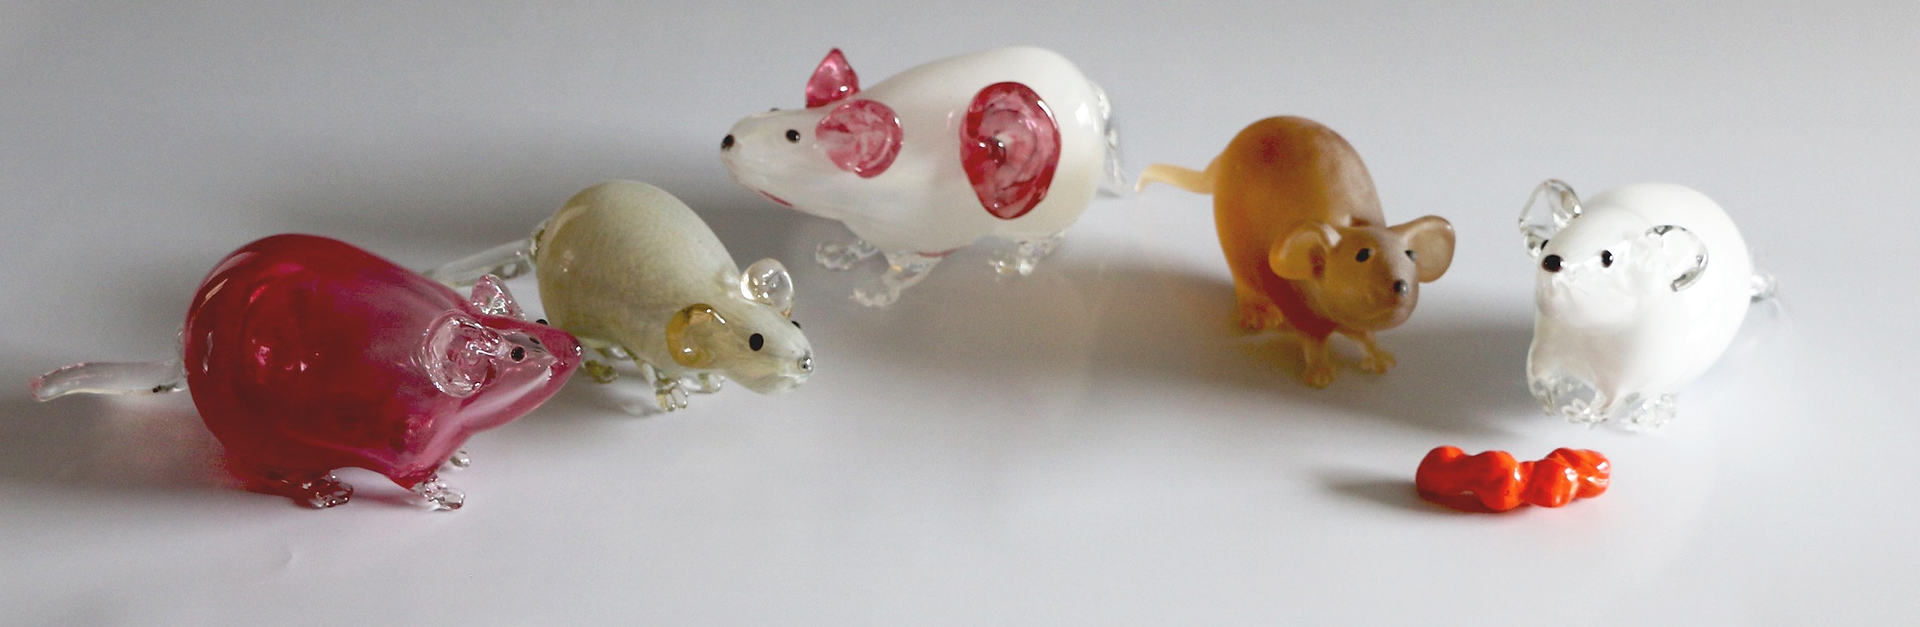 mice.cheeto.jpg